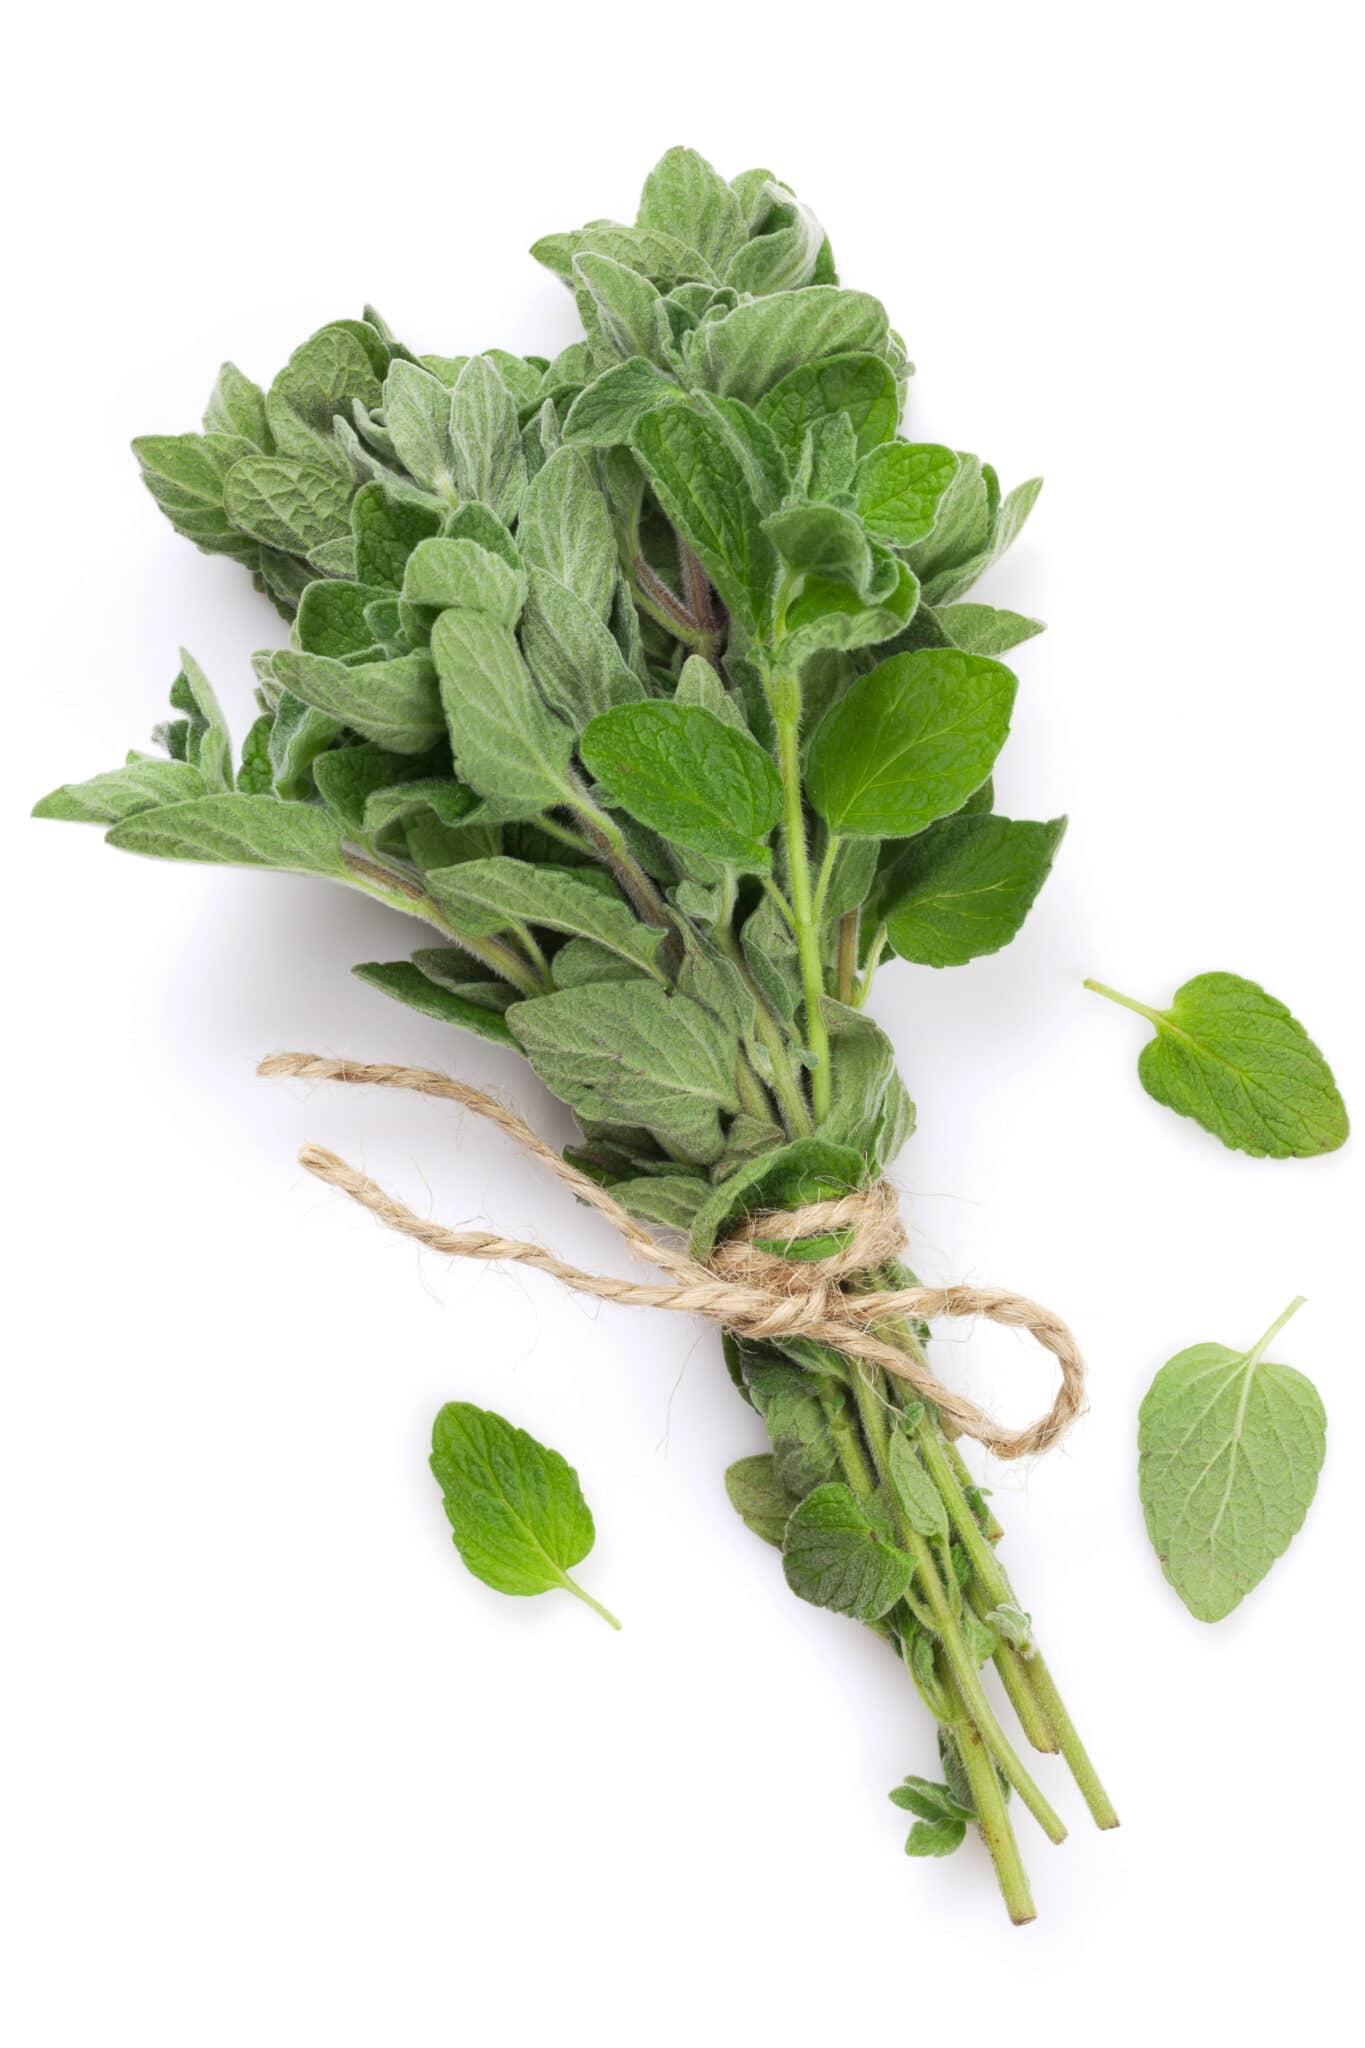 Fresh garden oregano herb. Isolated on white background.